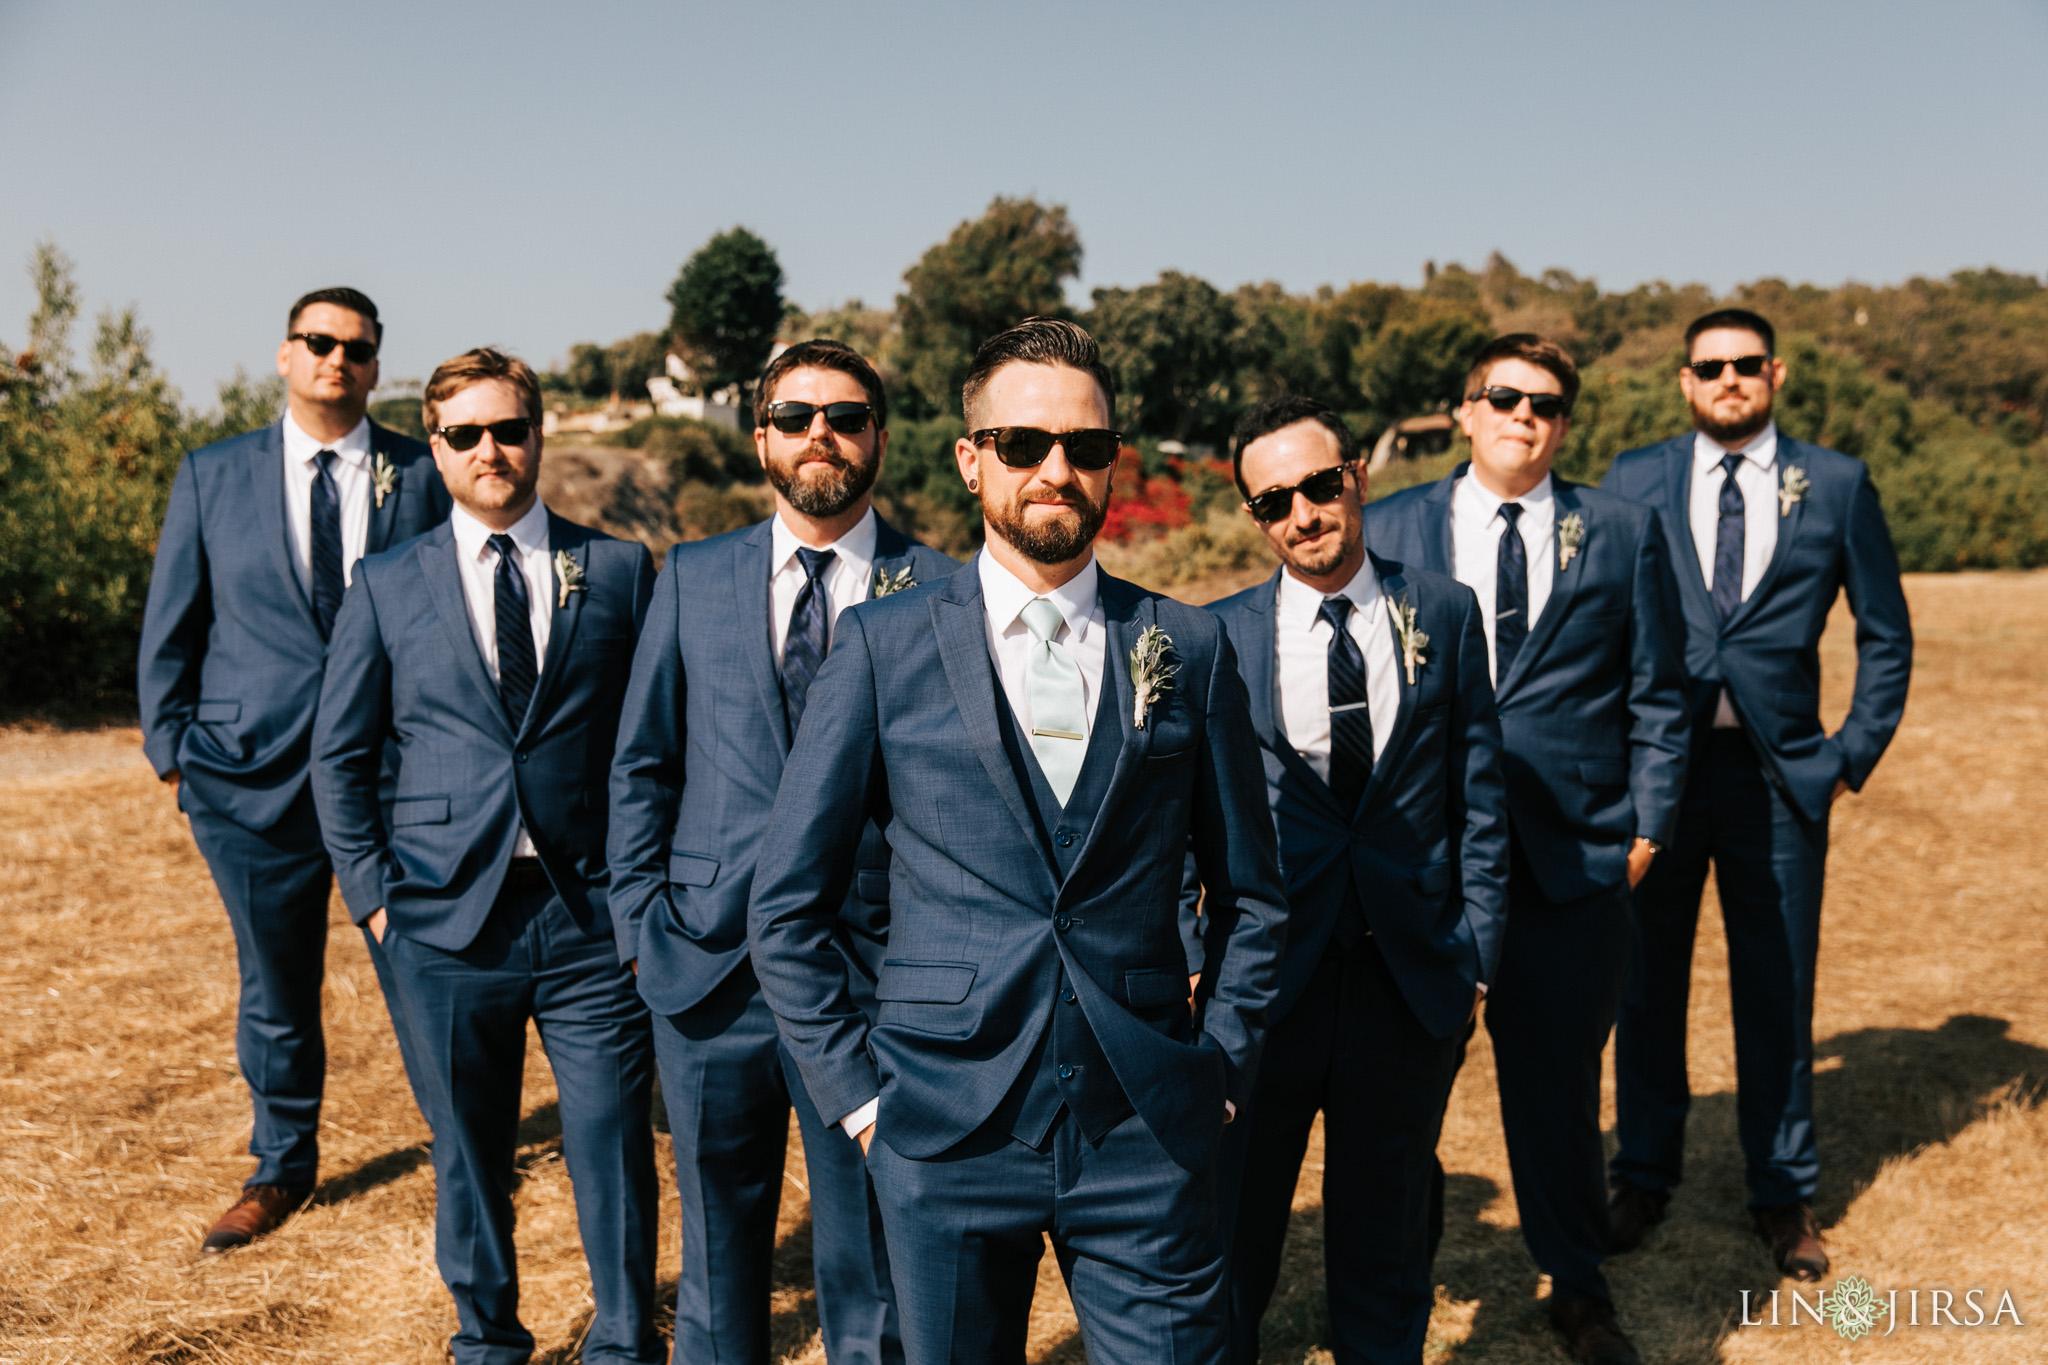 014 los verdes golf course groomsmen wedding photography